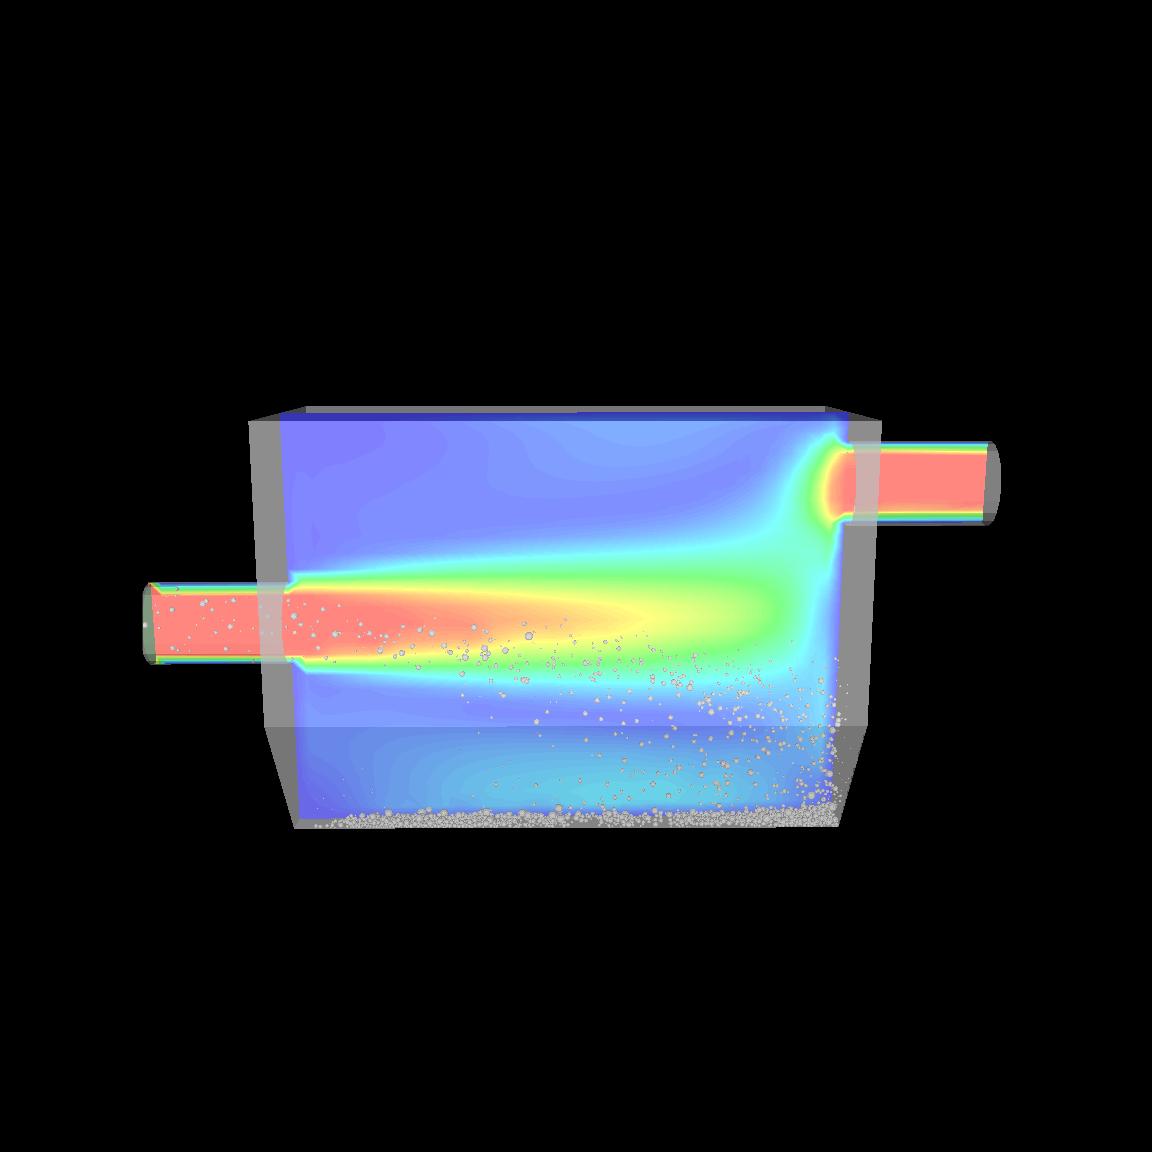 Discrete element modelling (DEM) 2